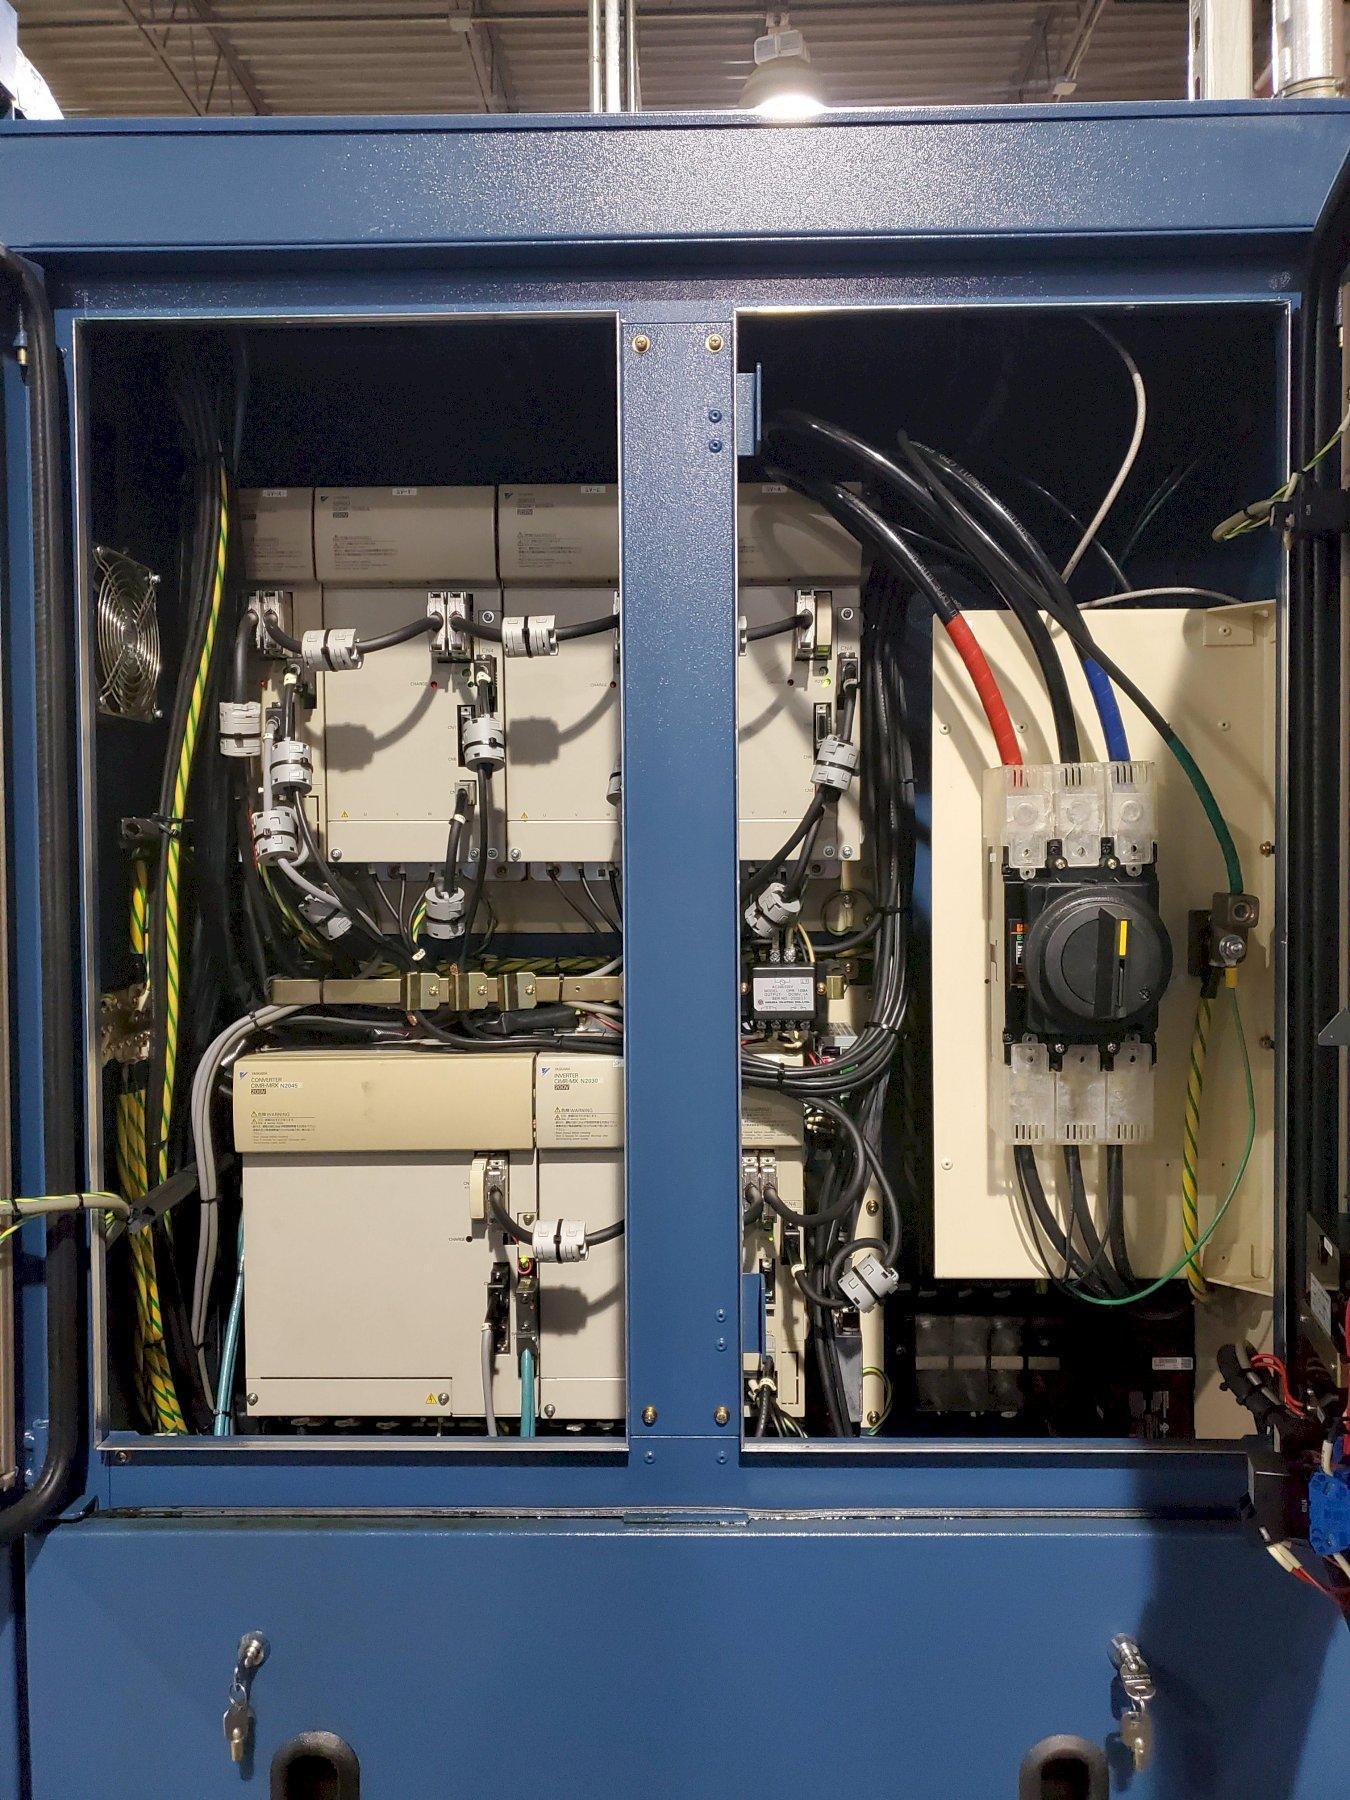 Matsuura MAM72-63V PC6 5-Axis Vertical Machining Center